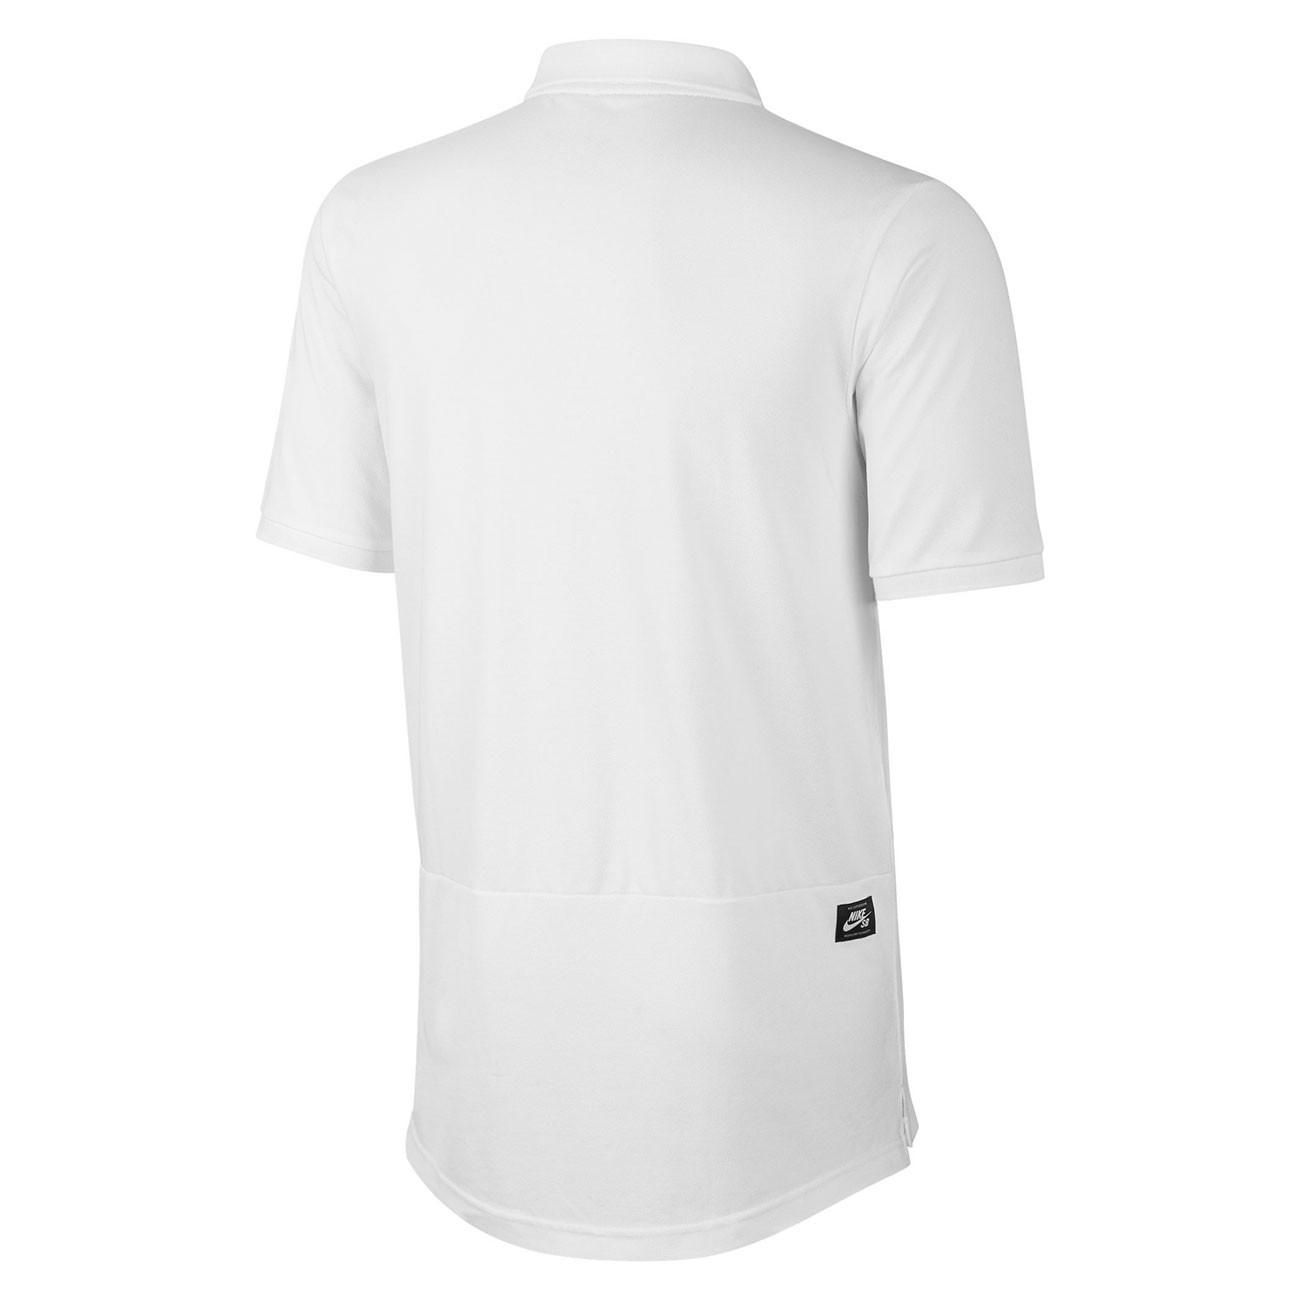 74d8e9be6a94f8 T-shirt Nike SB Pique Polo white hyper royal